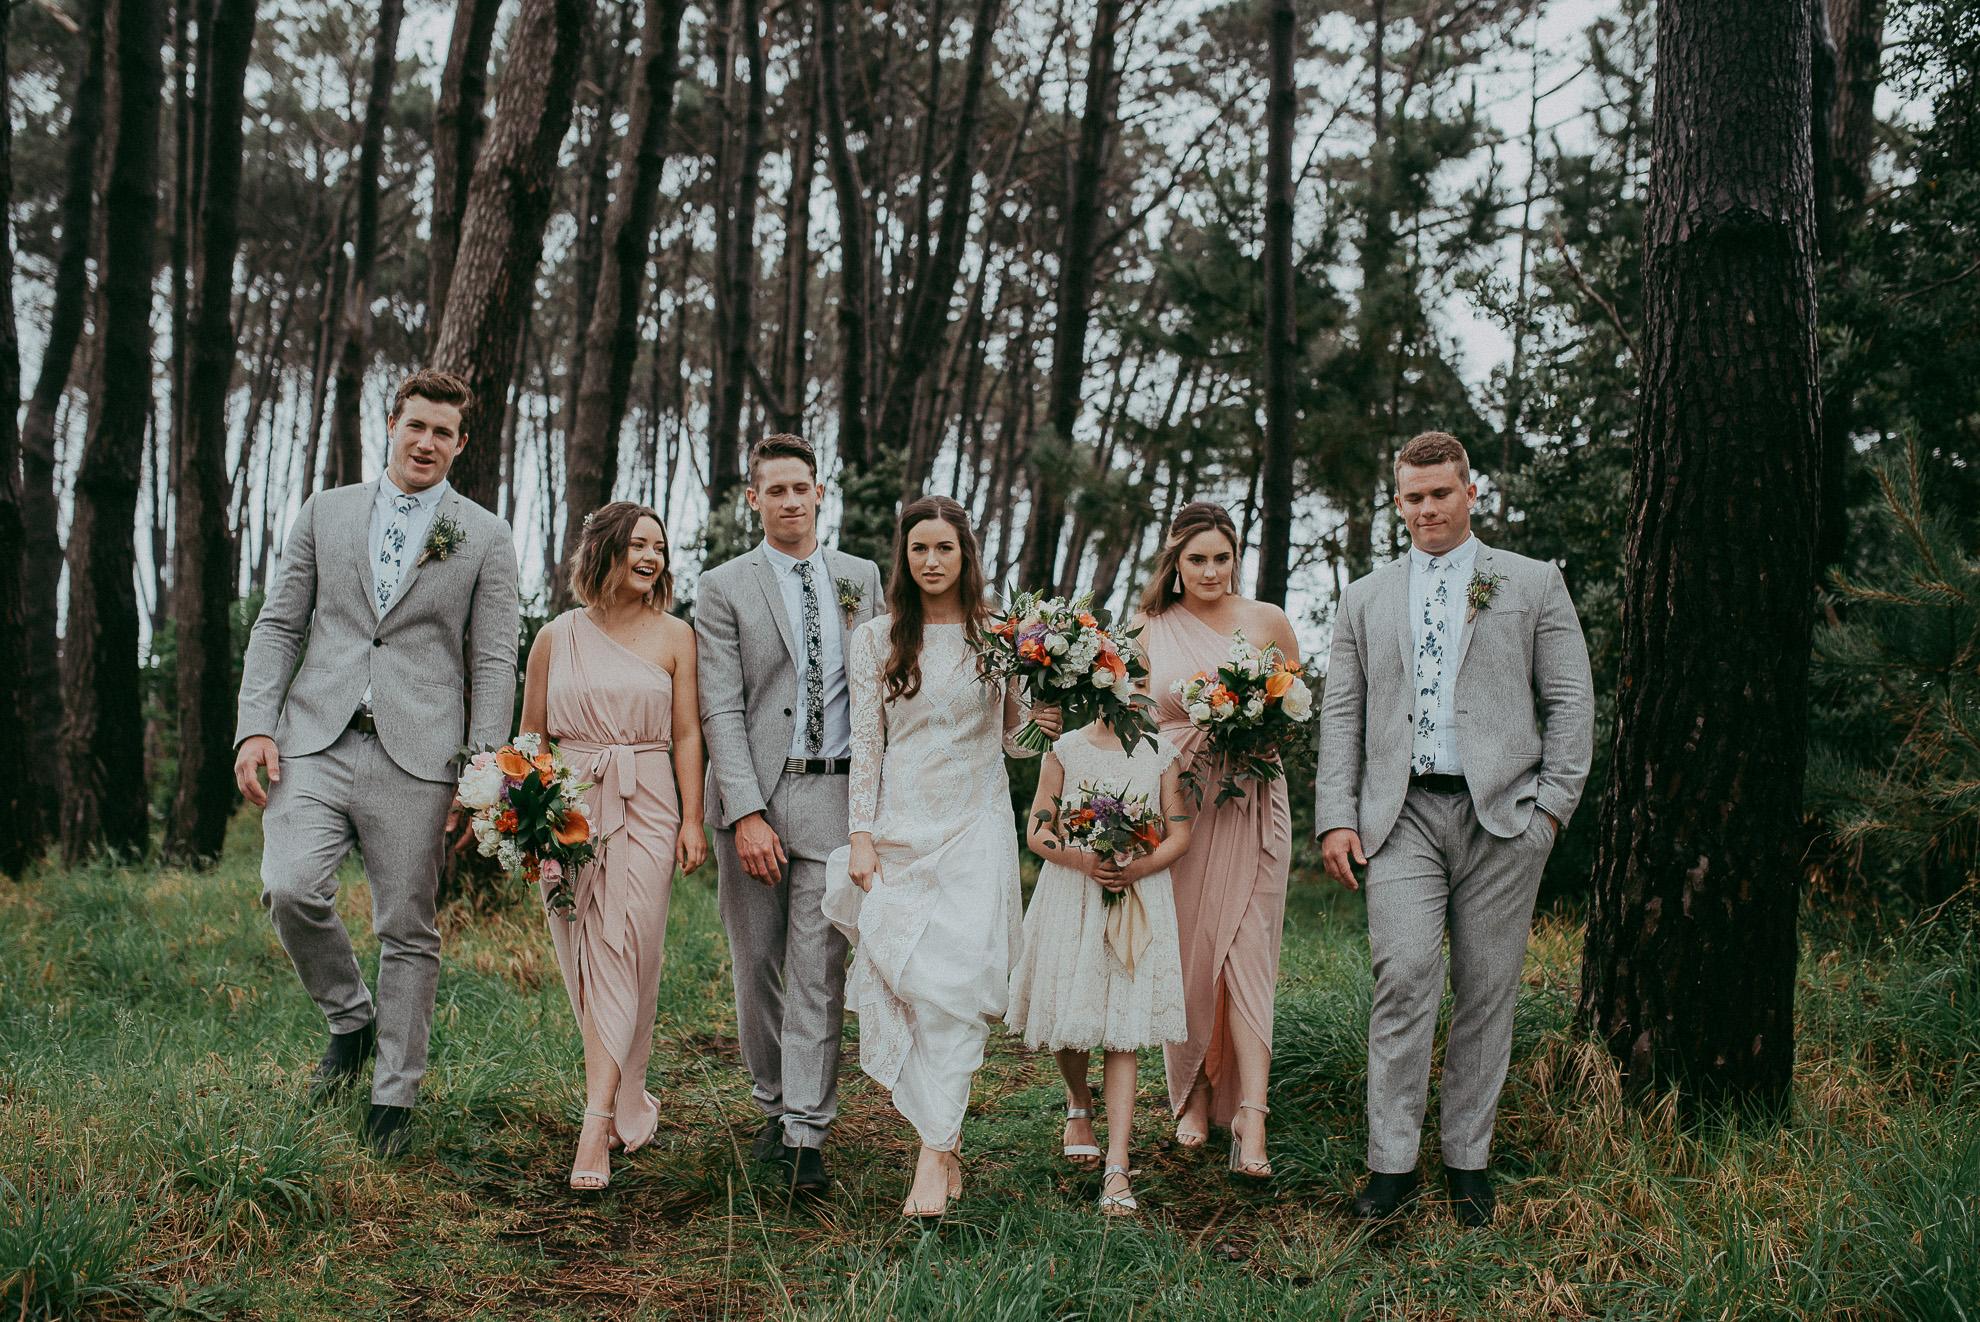 Woodhill Forest - Muriwai Beach {Aukland wedding photographer}